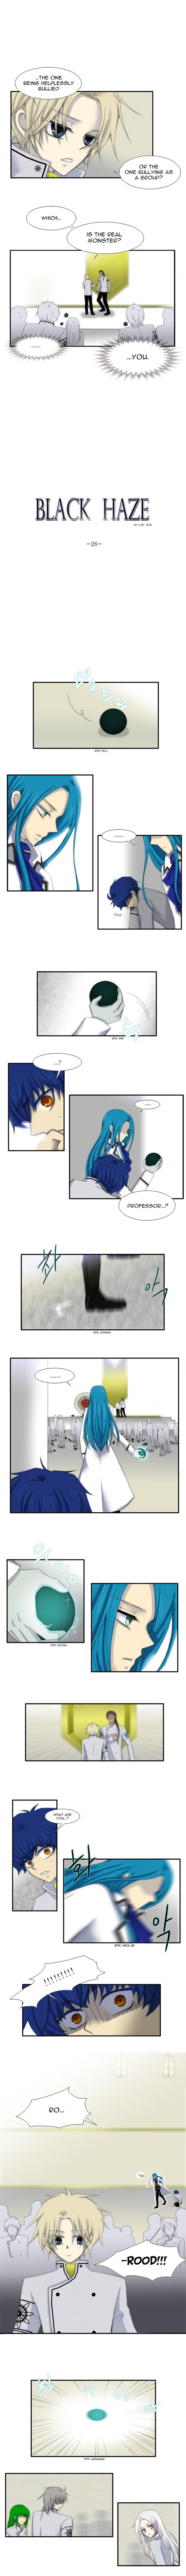 Black Haze 26 Page 1